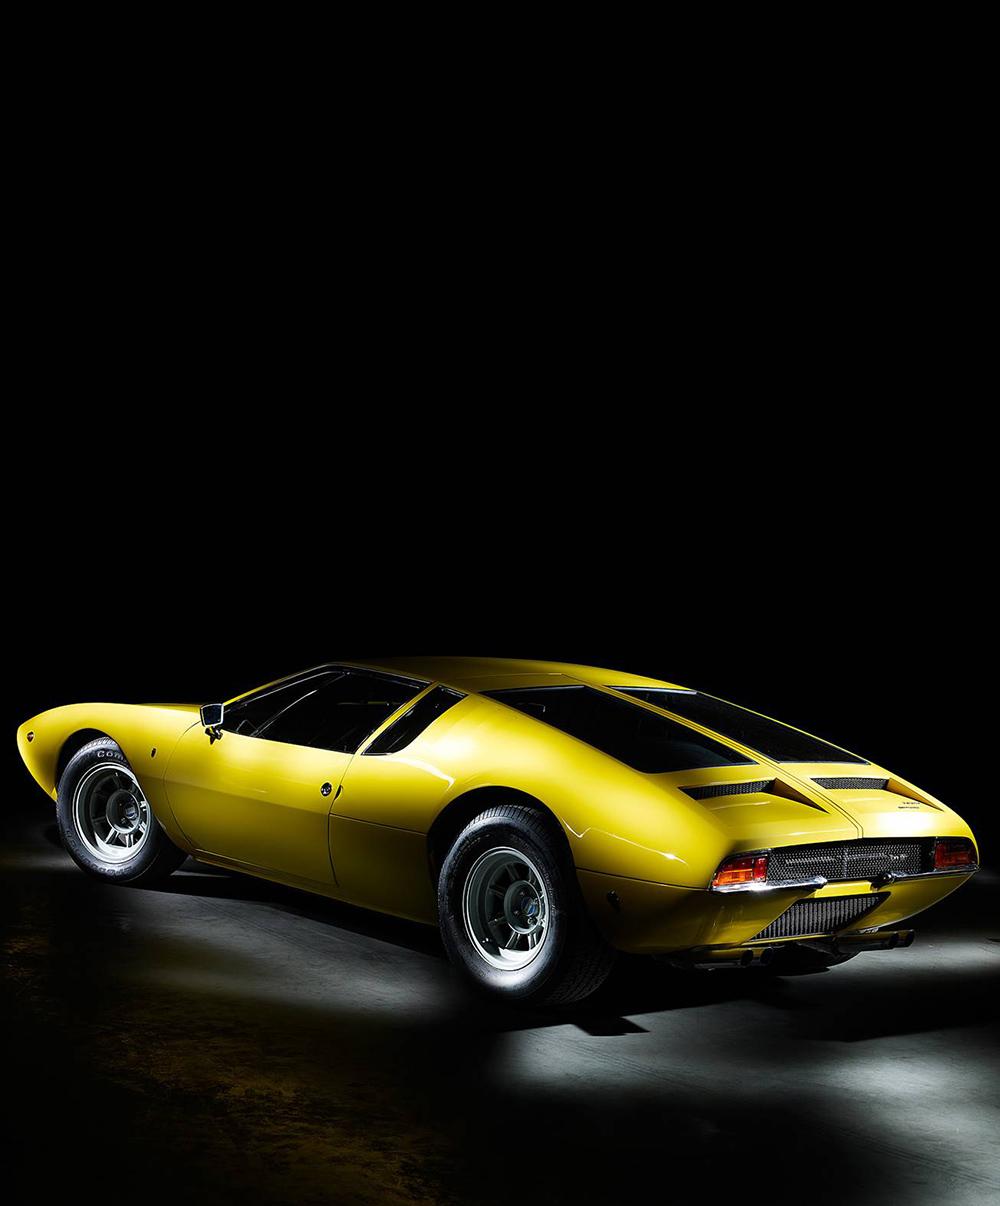 mangusta 12 Ευτυχία είναι να ακούς τον V8 της De Tomaso Mangusta De Tomaso, De Tomaso Mangusta, videos